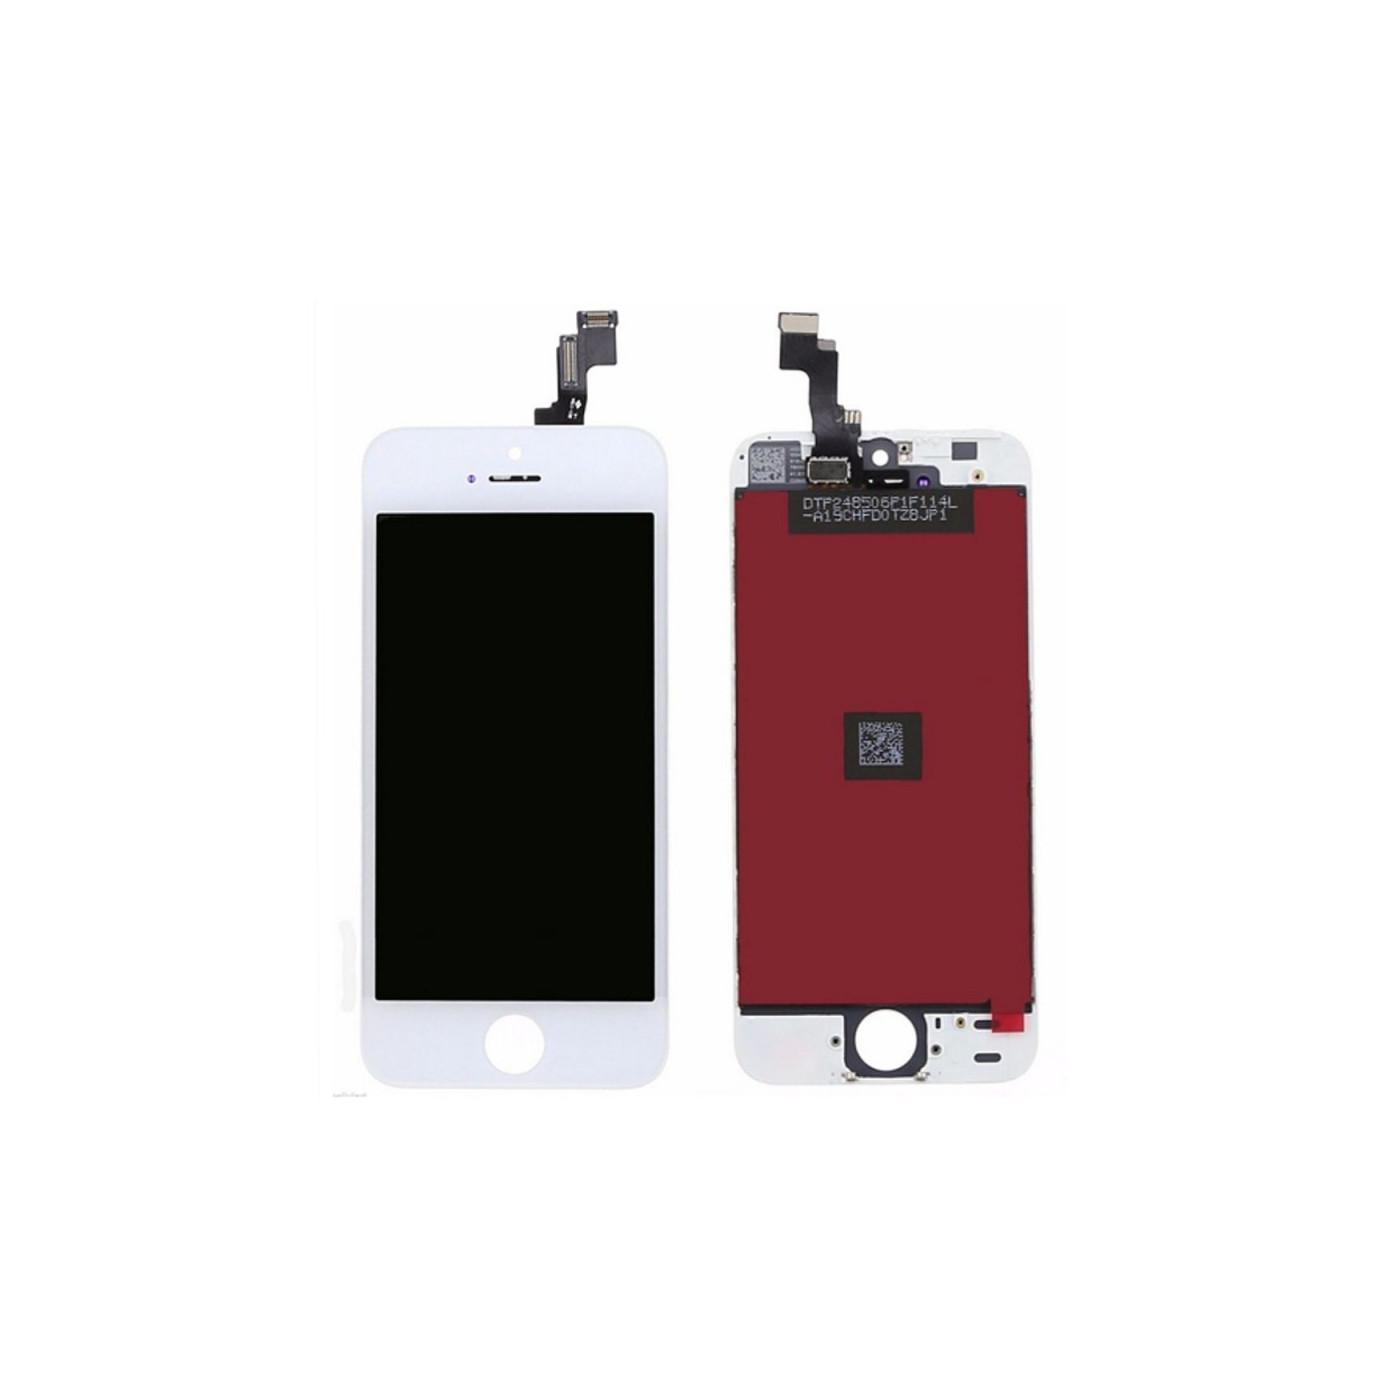 Touch screen display LCD per apple iphone SE nero frame vetro retina